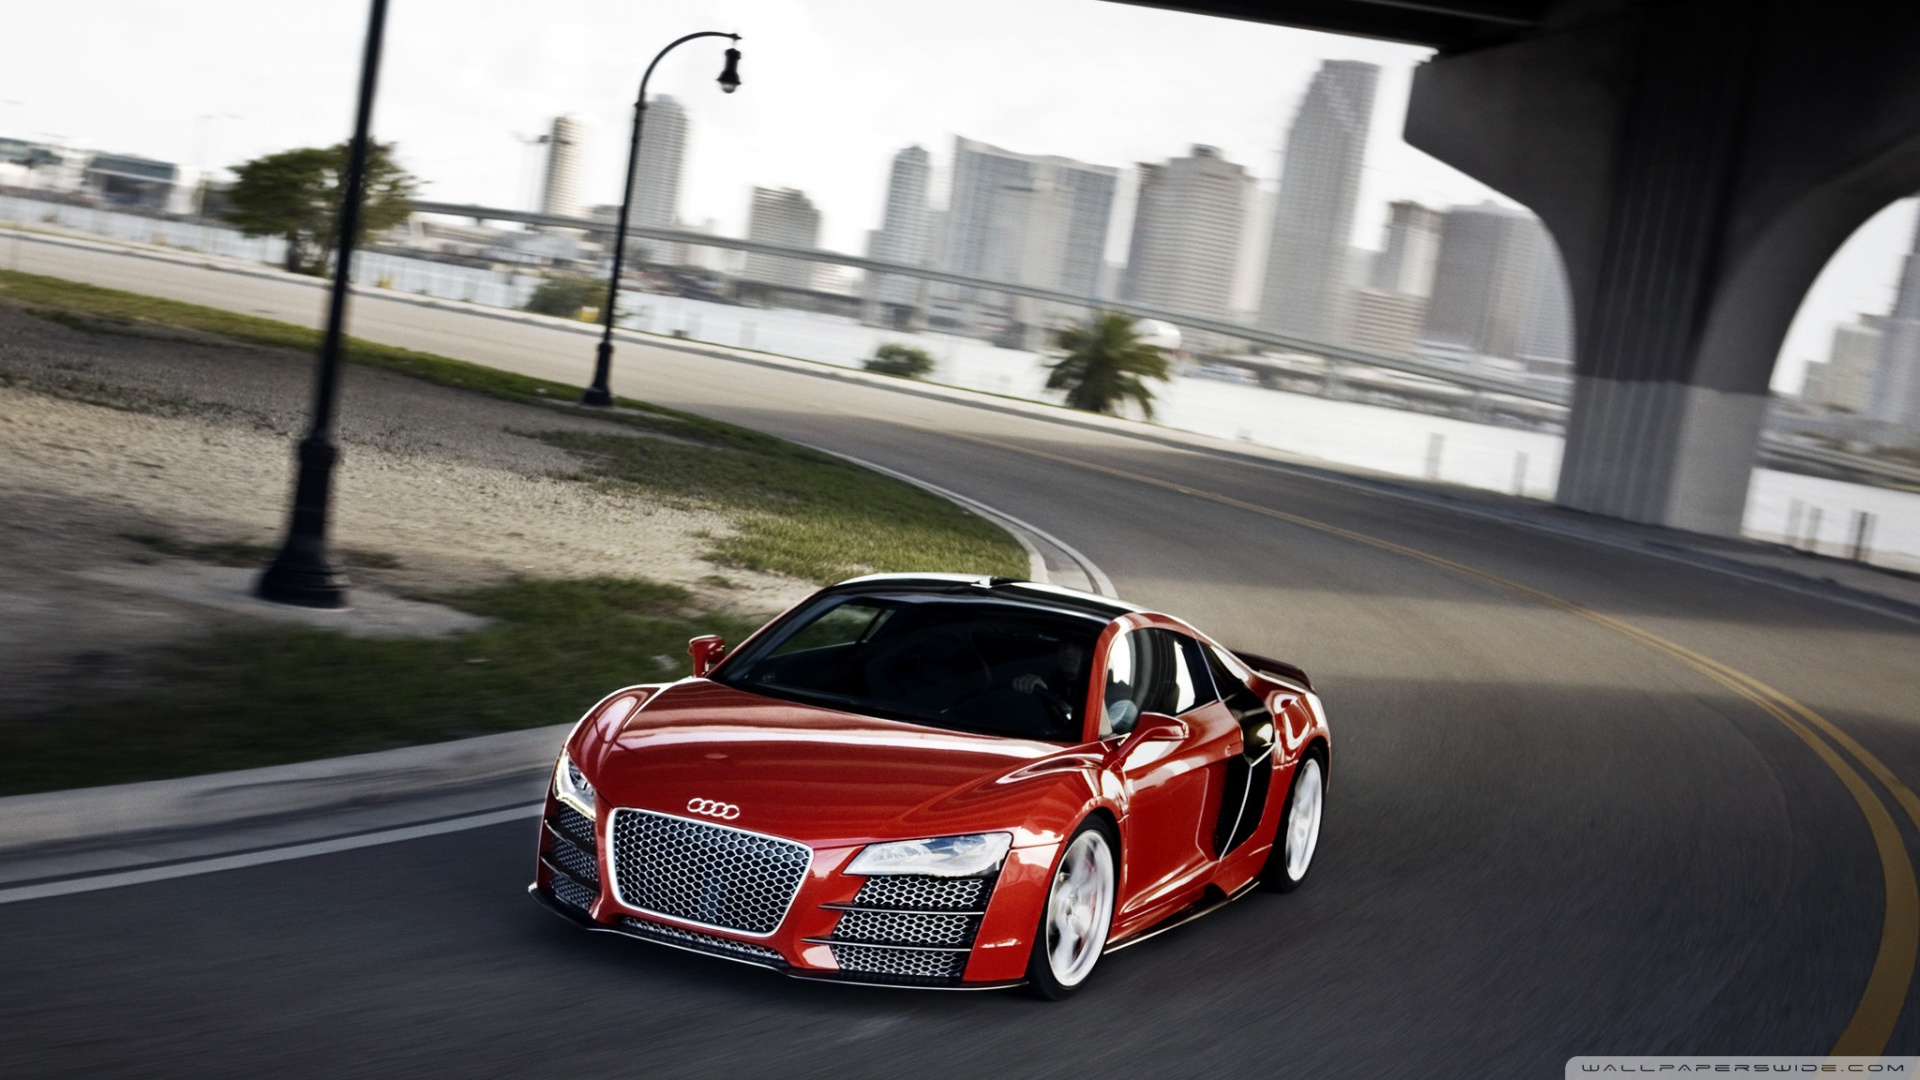 Audi R8 Tdi Le Mans Concept 1 Wallpaper 1920x1080 Audi R8 Tdi Le 1920x1080